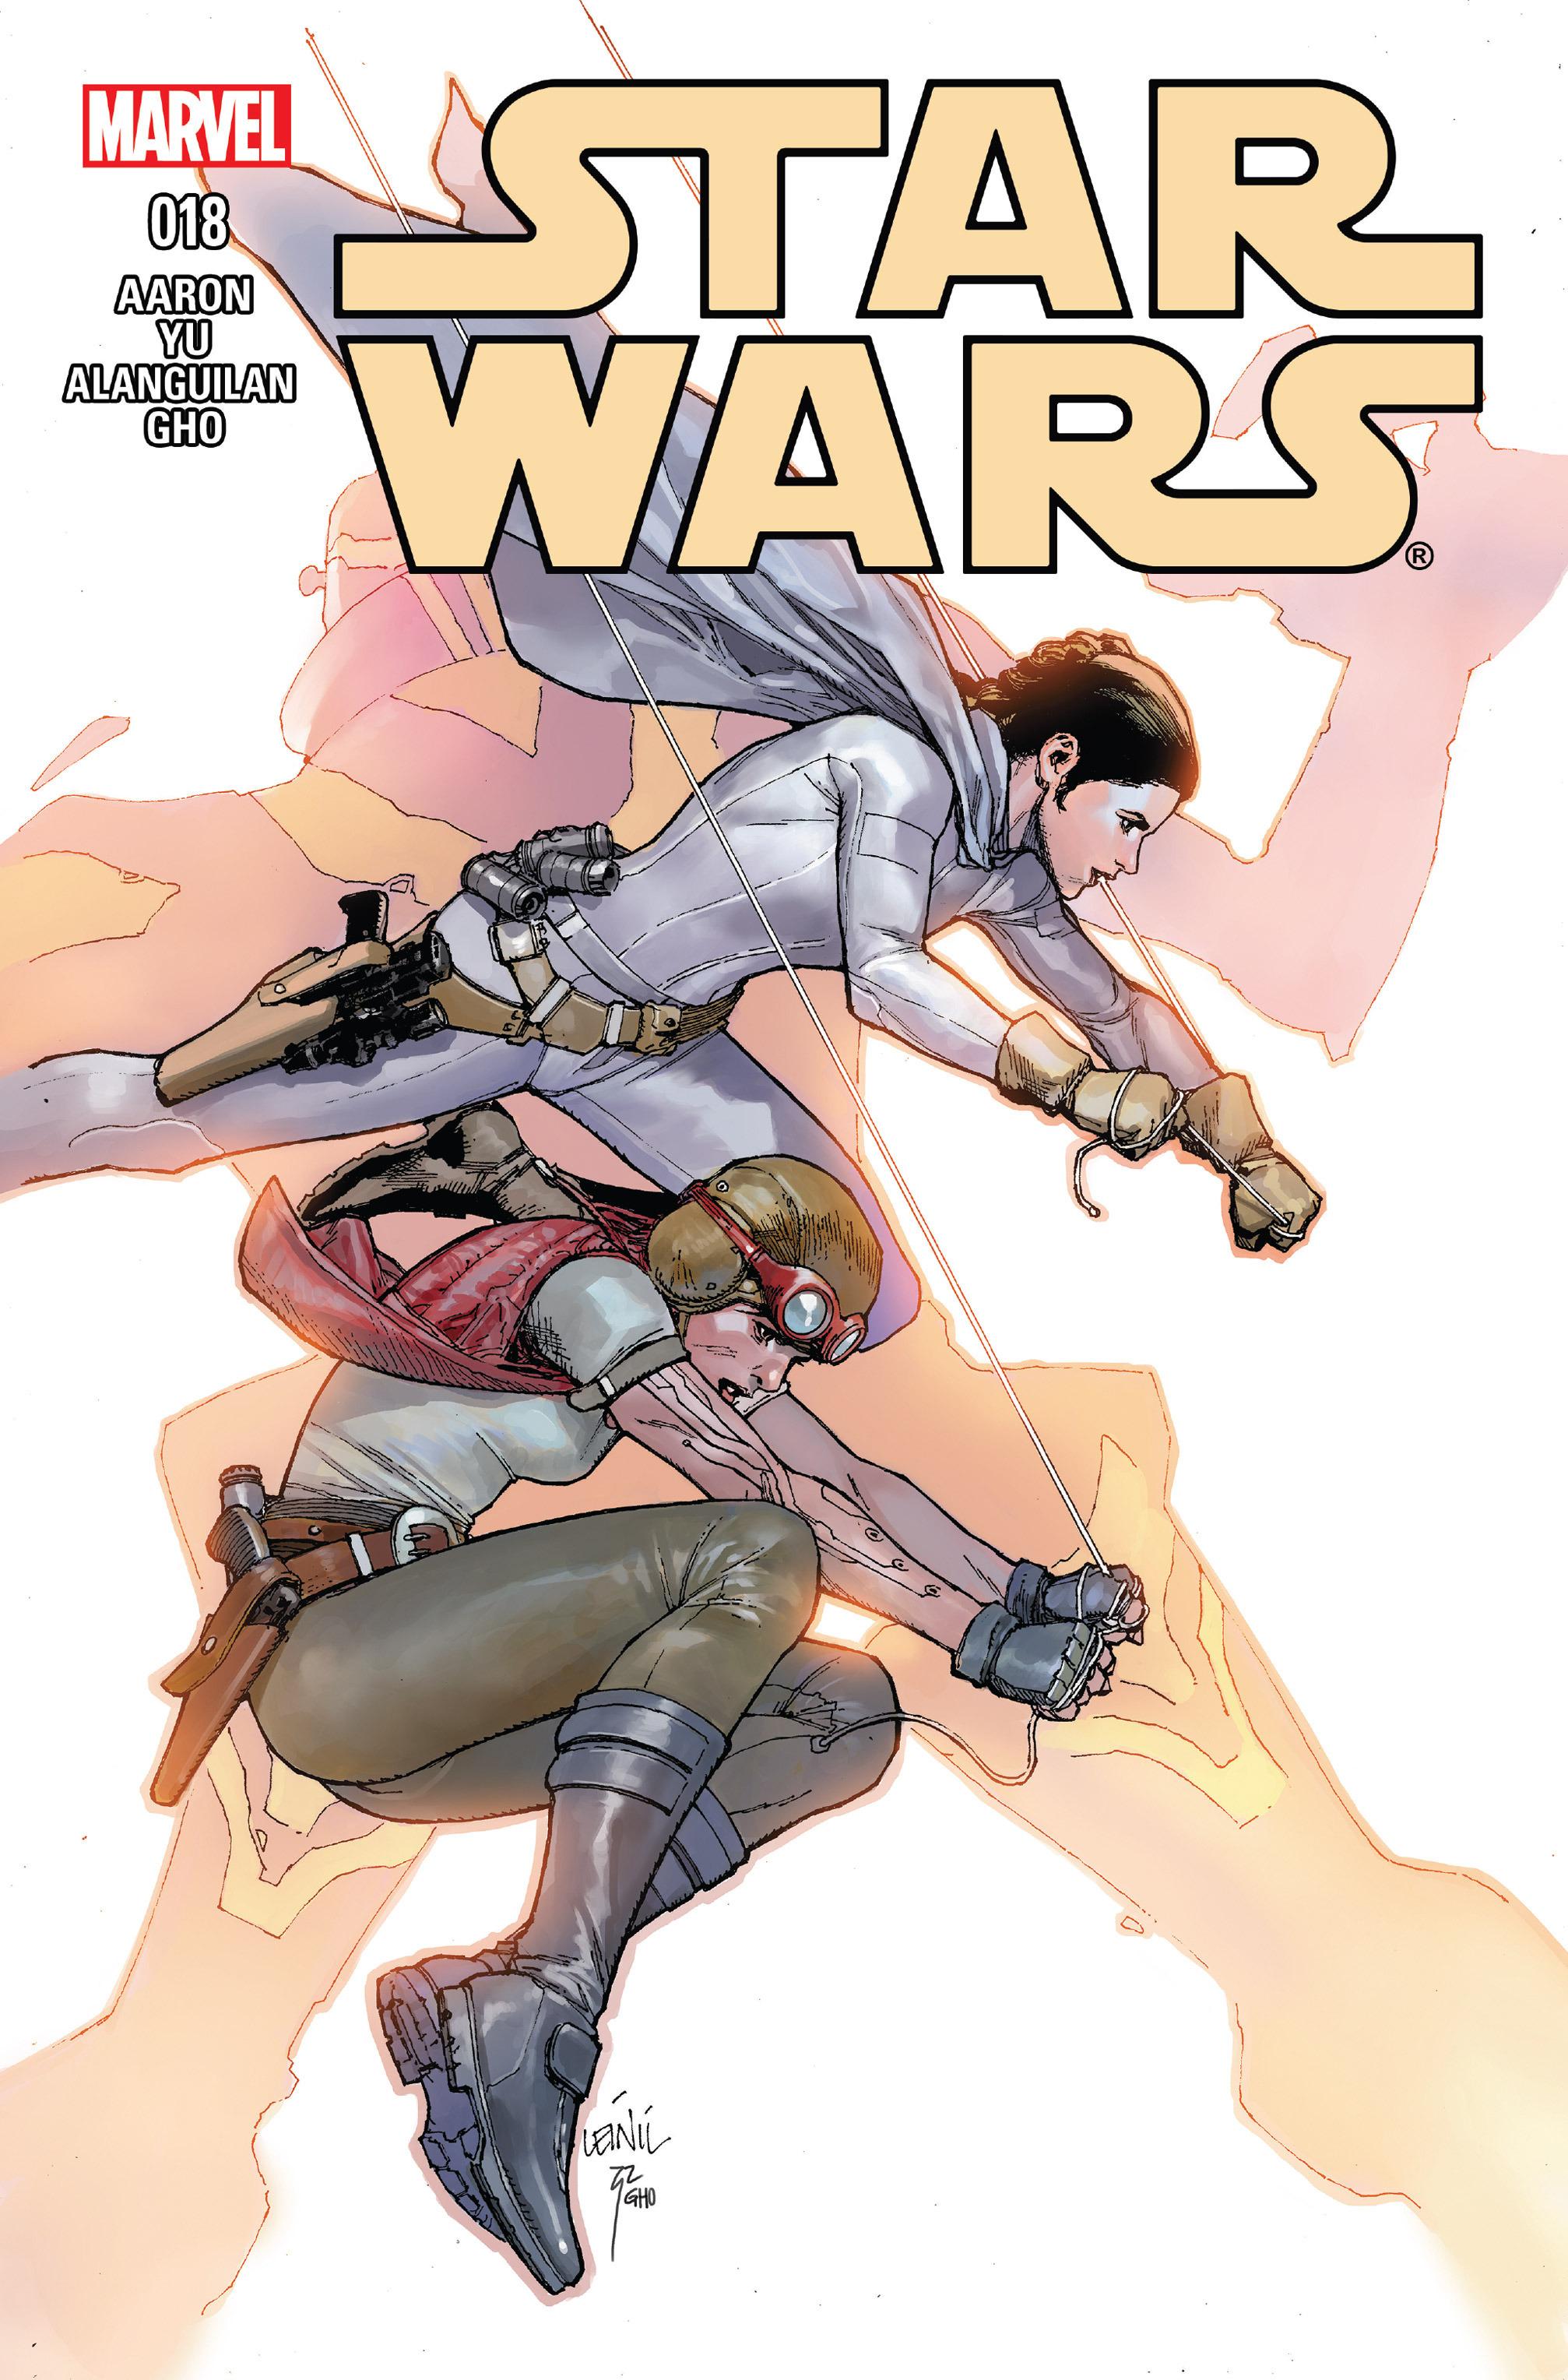 Star-Wars-018-000a